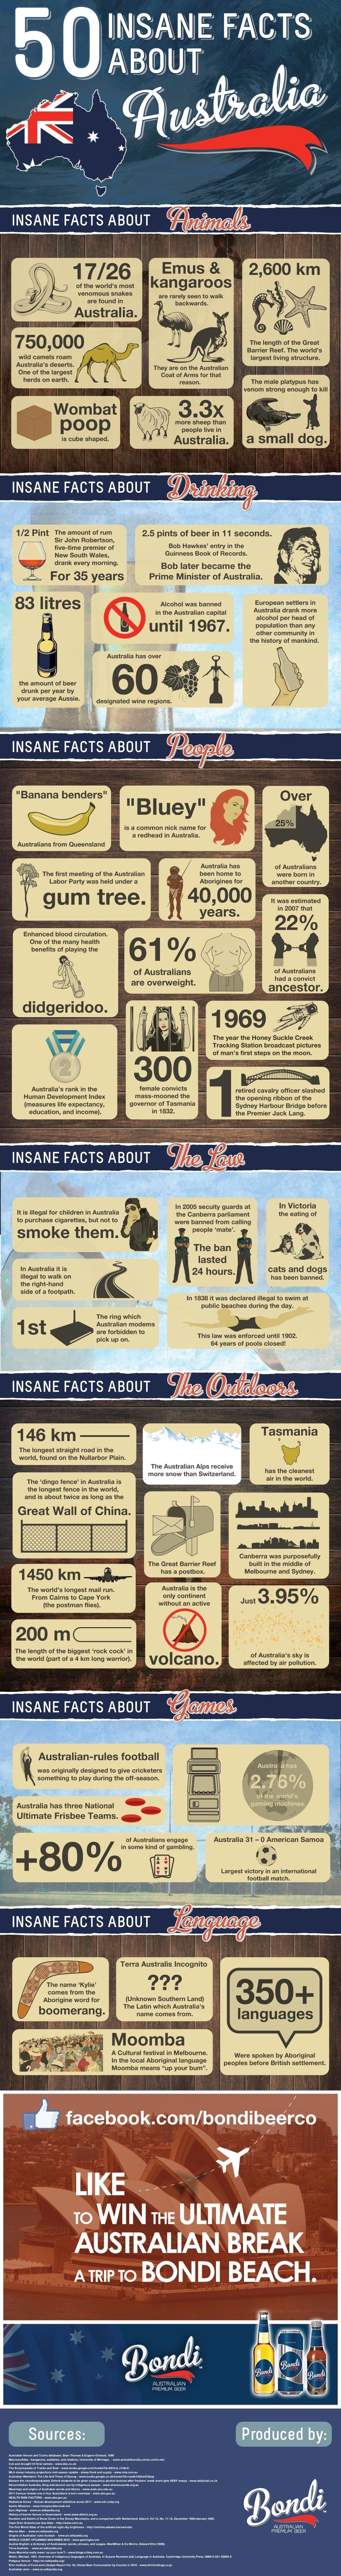 50-insane-facts-about-Australia_140814